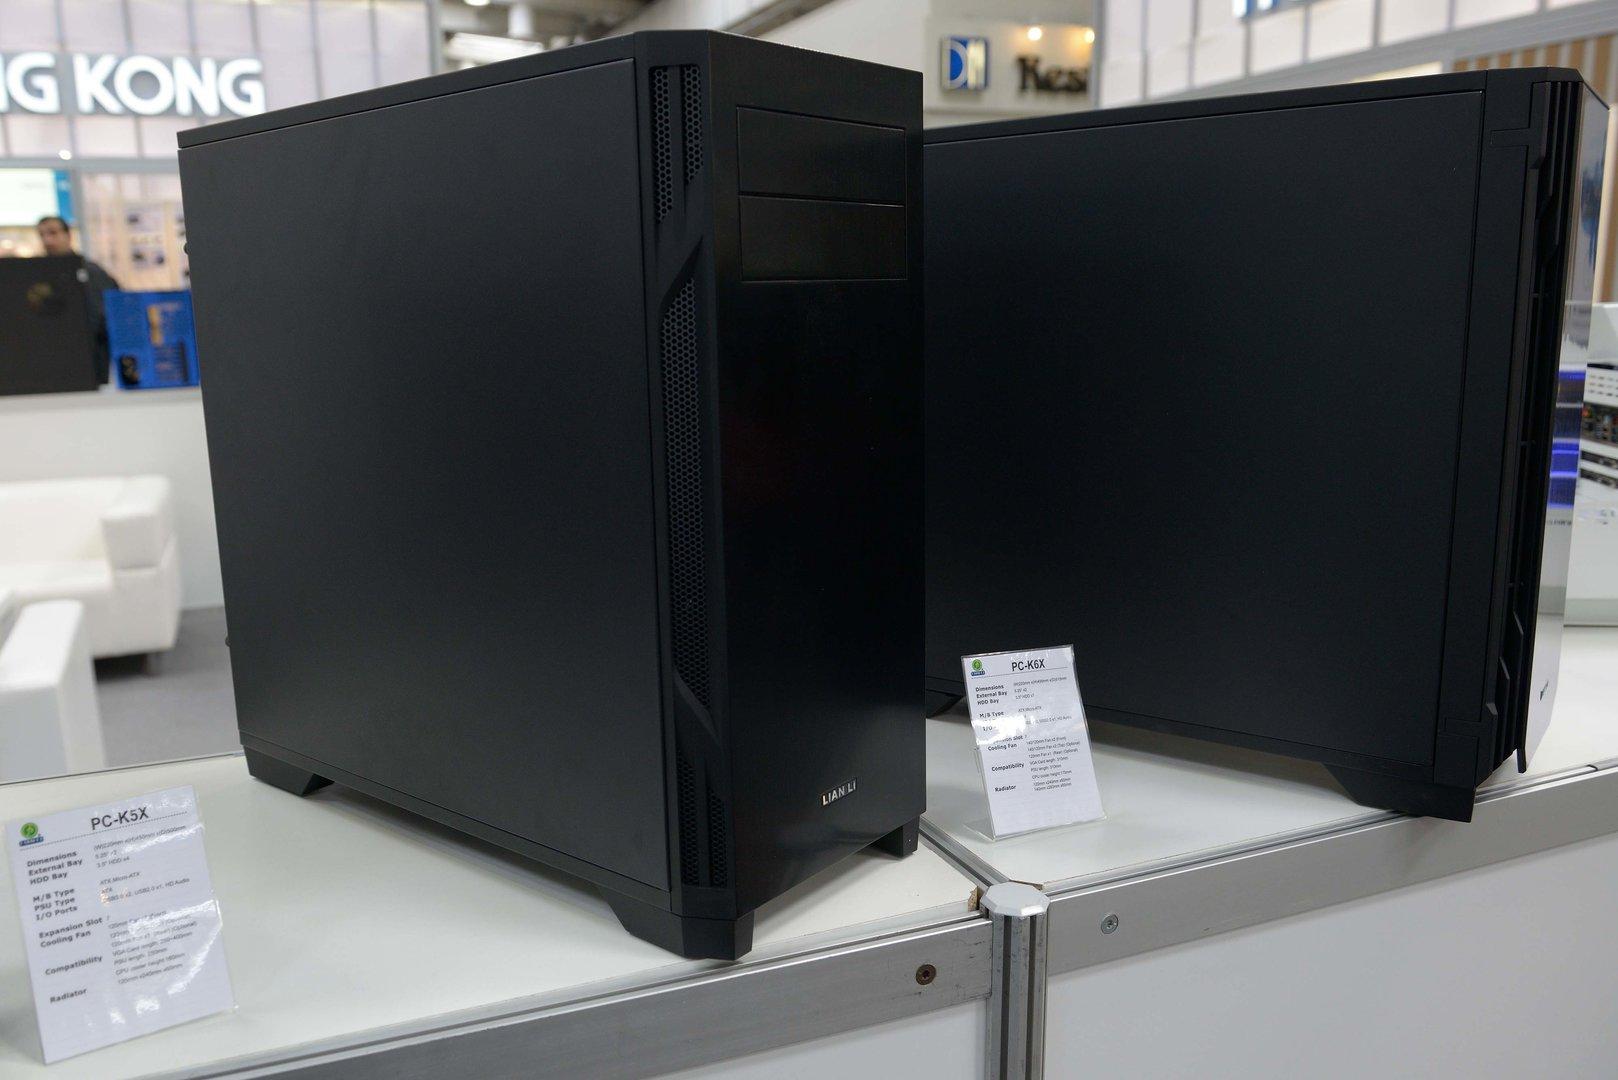 Lian Li PC-K6X